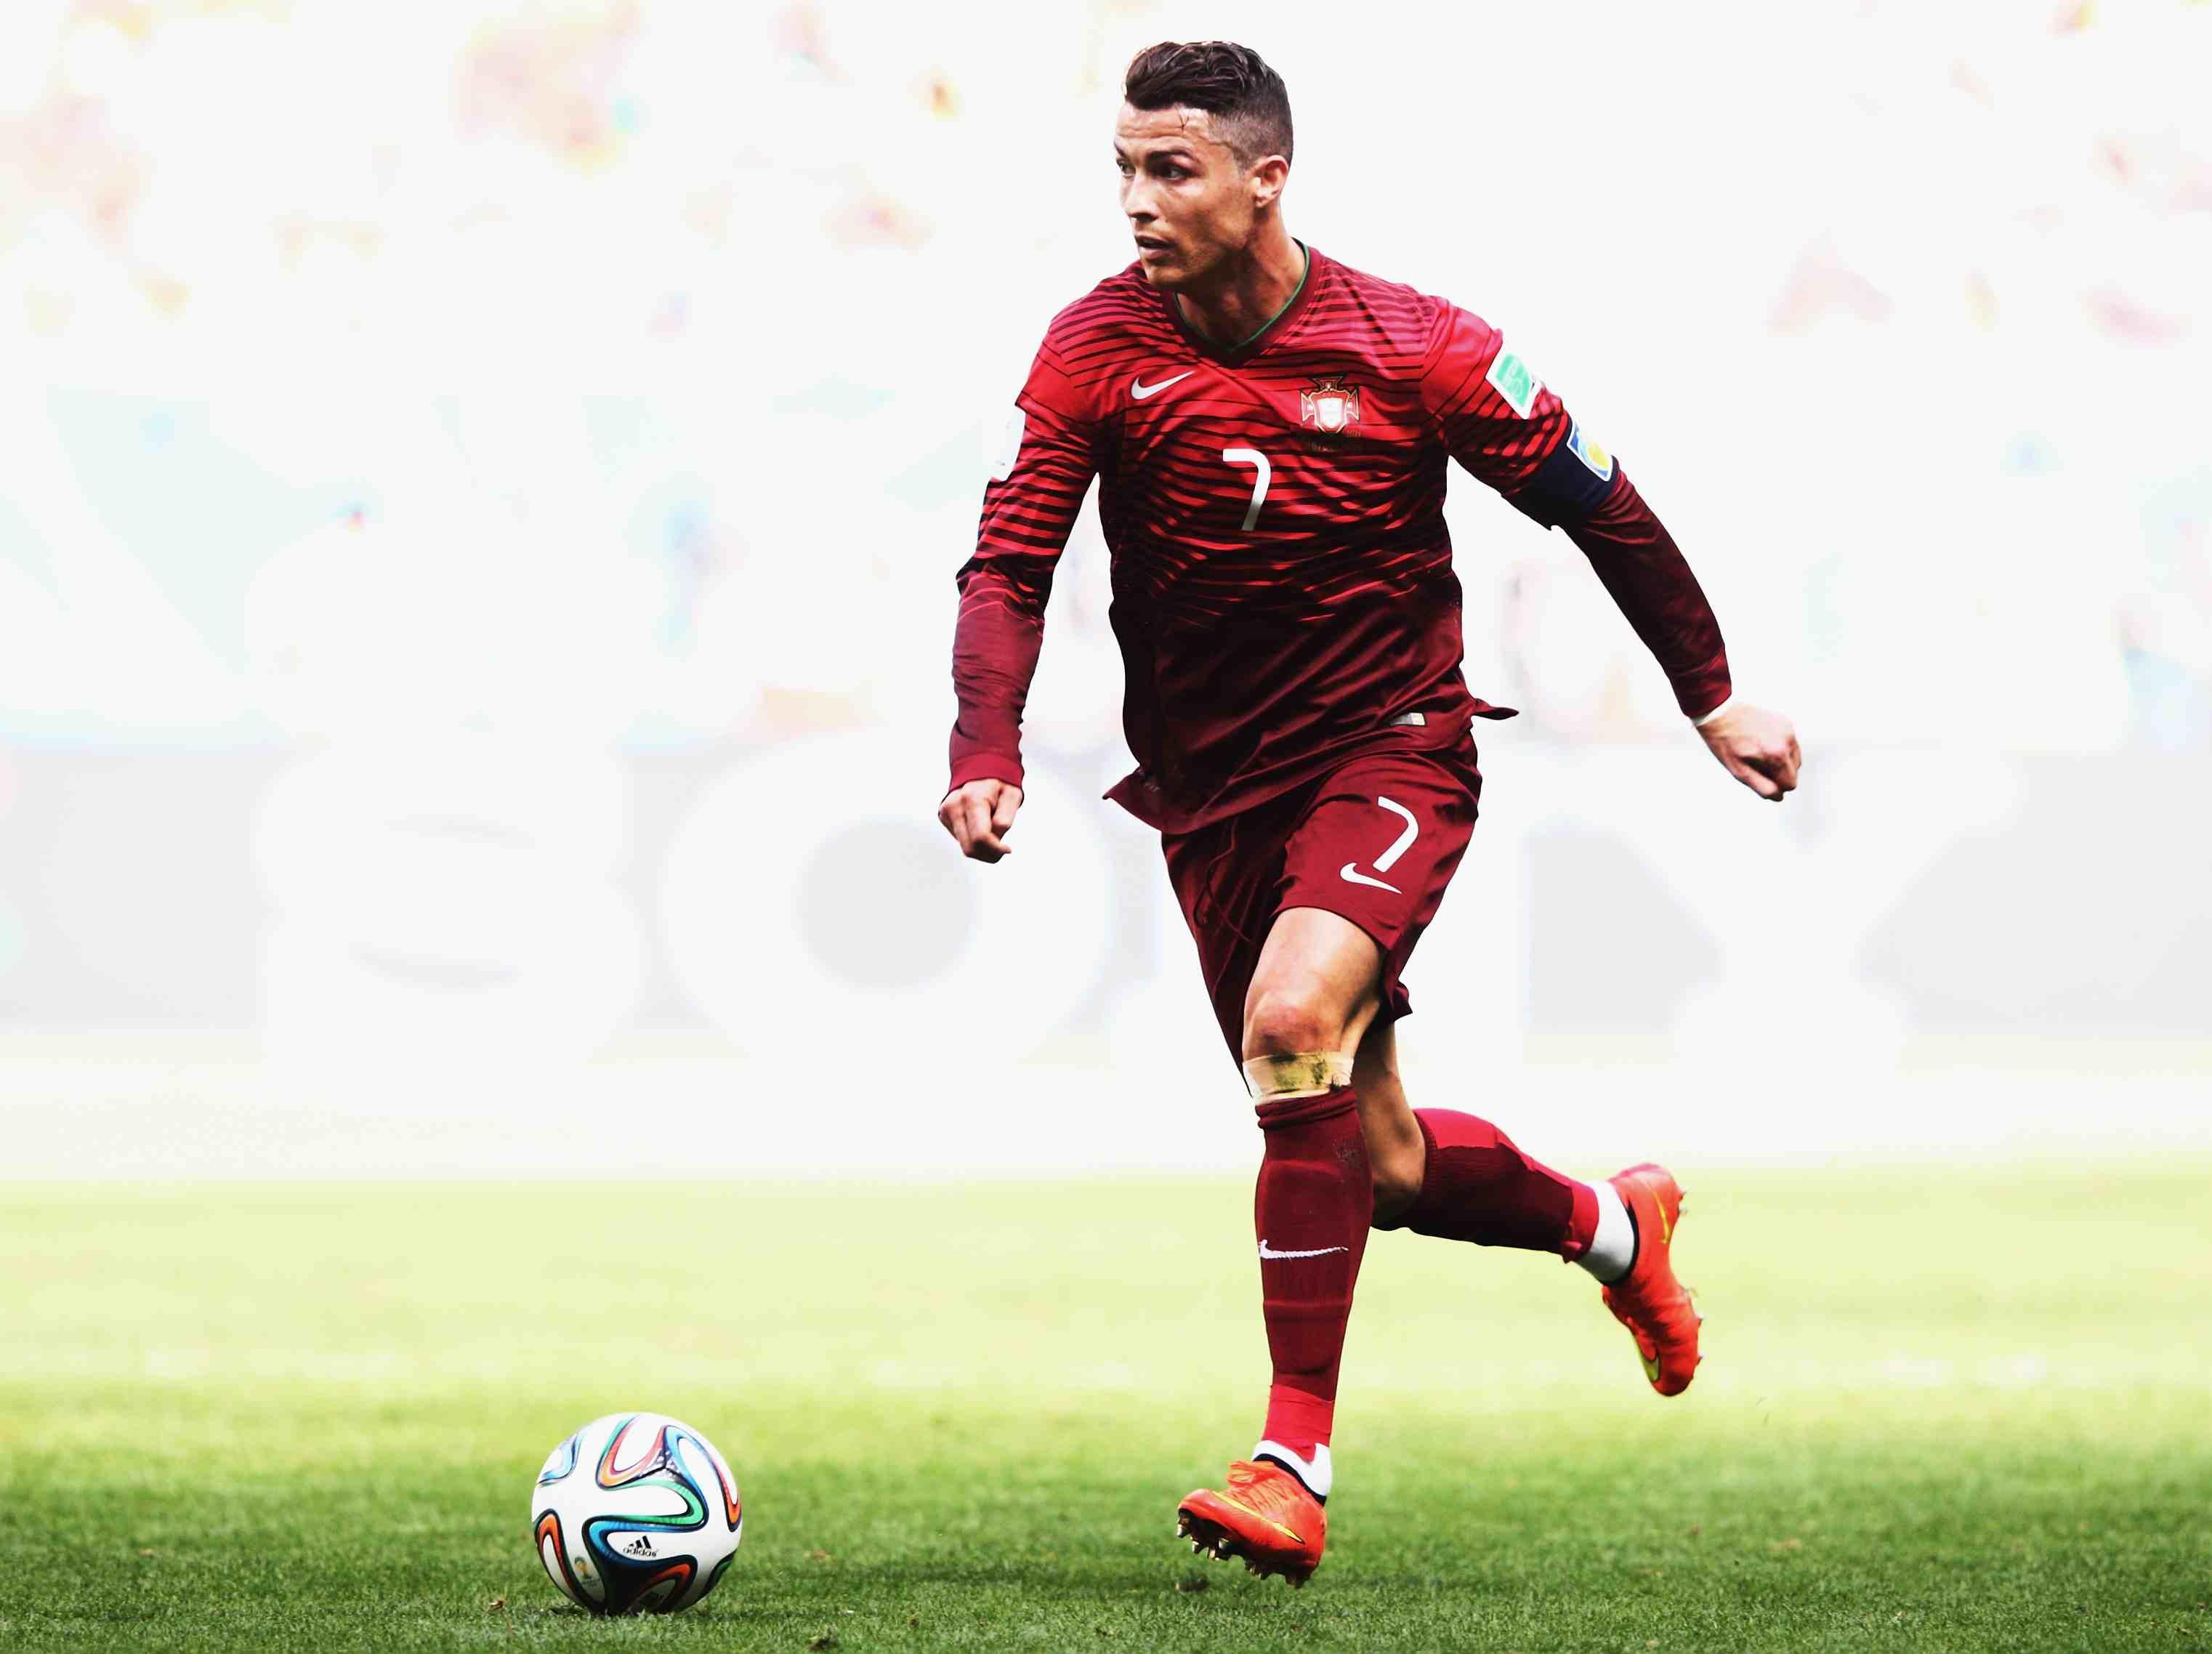 Cristiano Ronaldo playing against Ghana